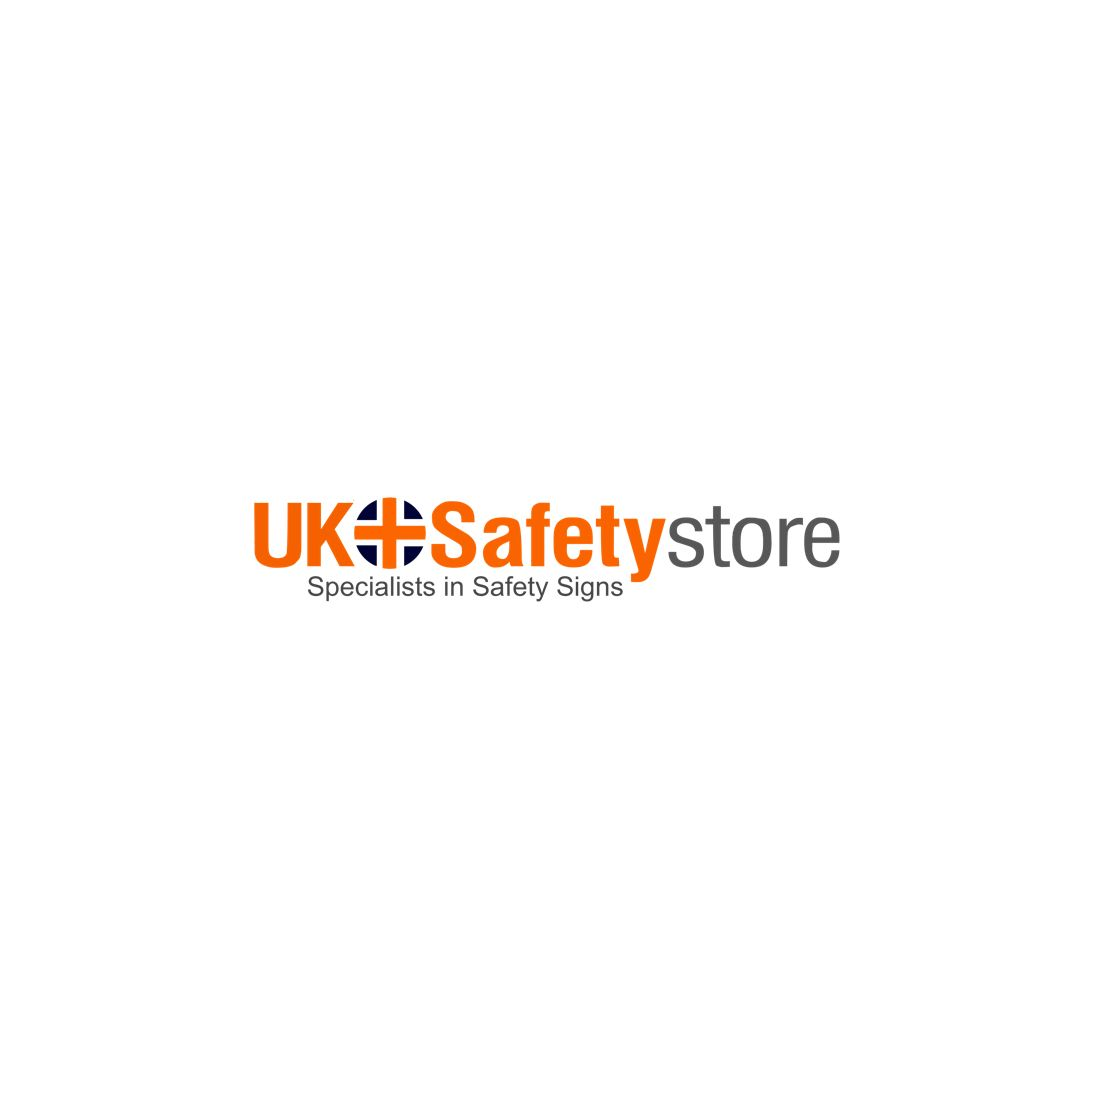 Danger High Voltage Cables Underground Sign 600W x 200Hmm - Rigid Plastic